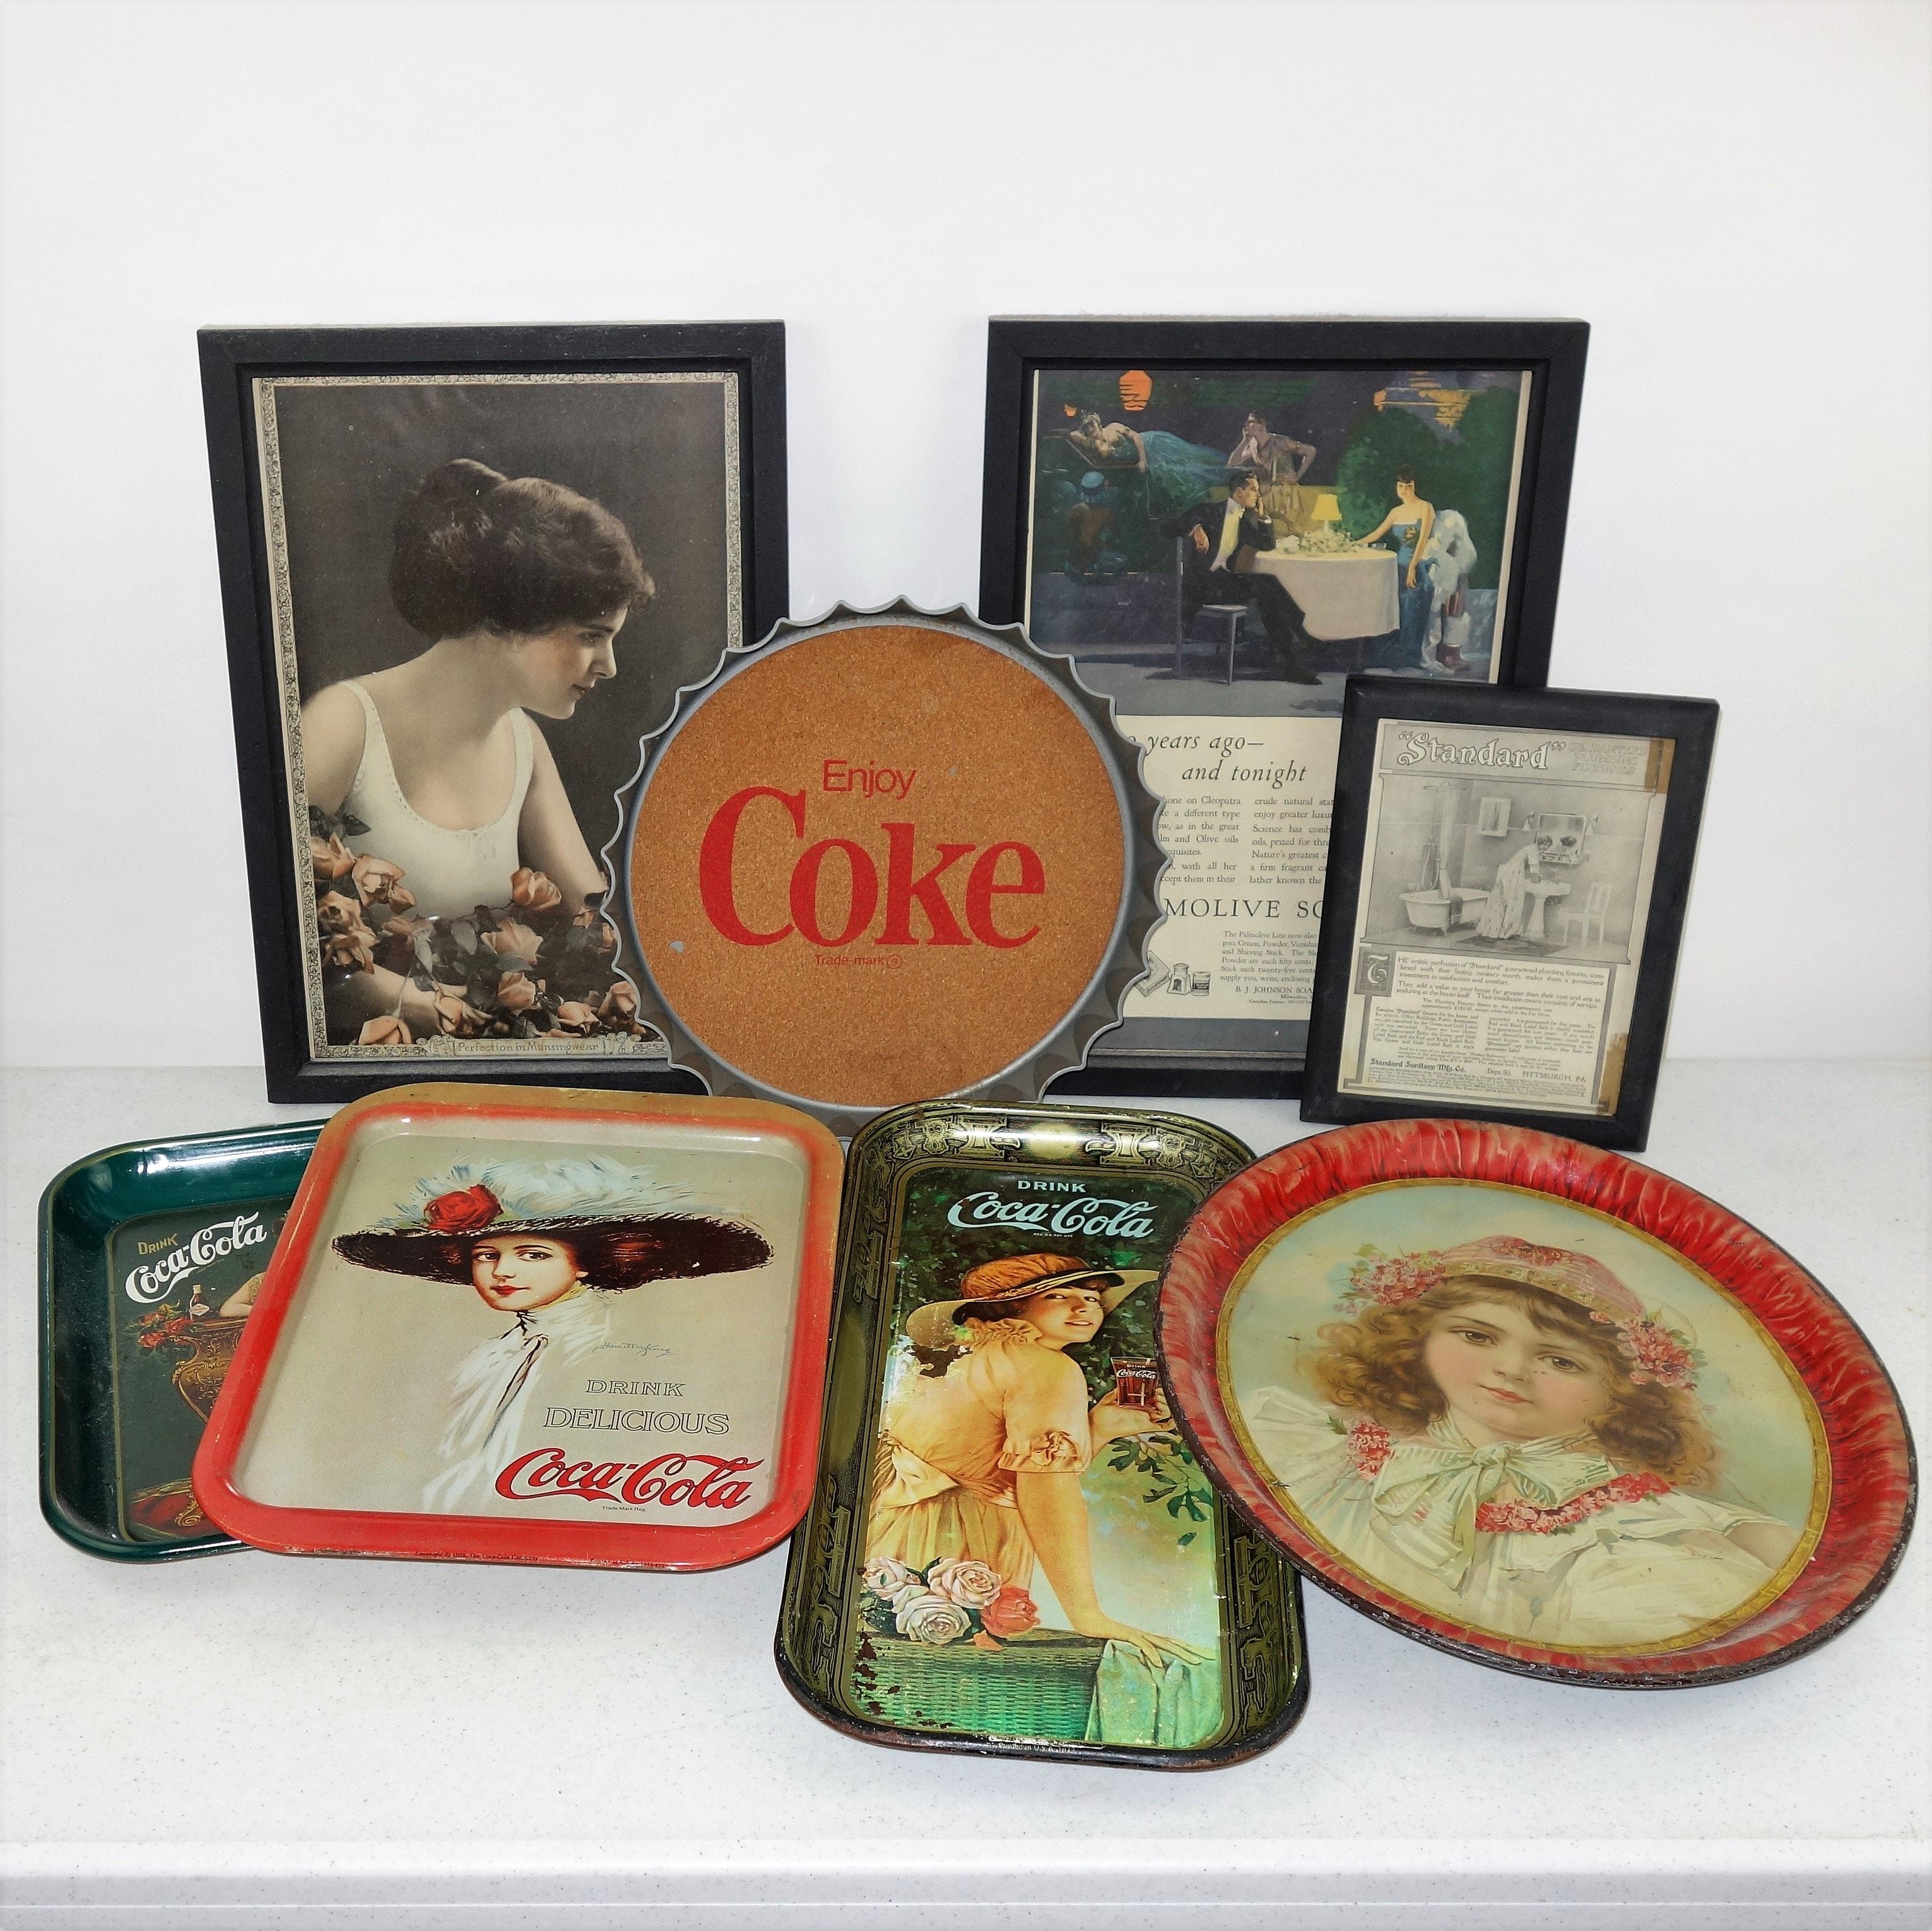 Vintage Coca-Cola Tins and Framed Advertisements